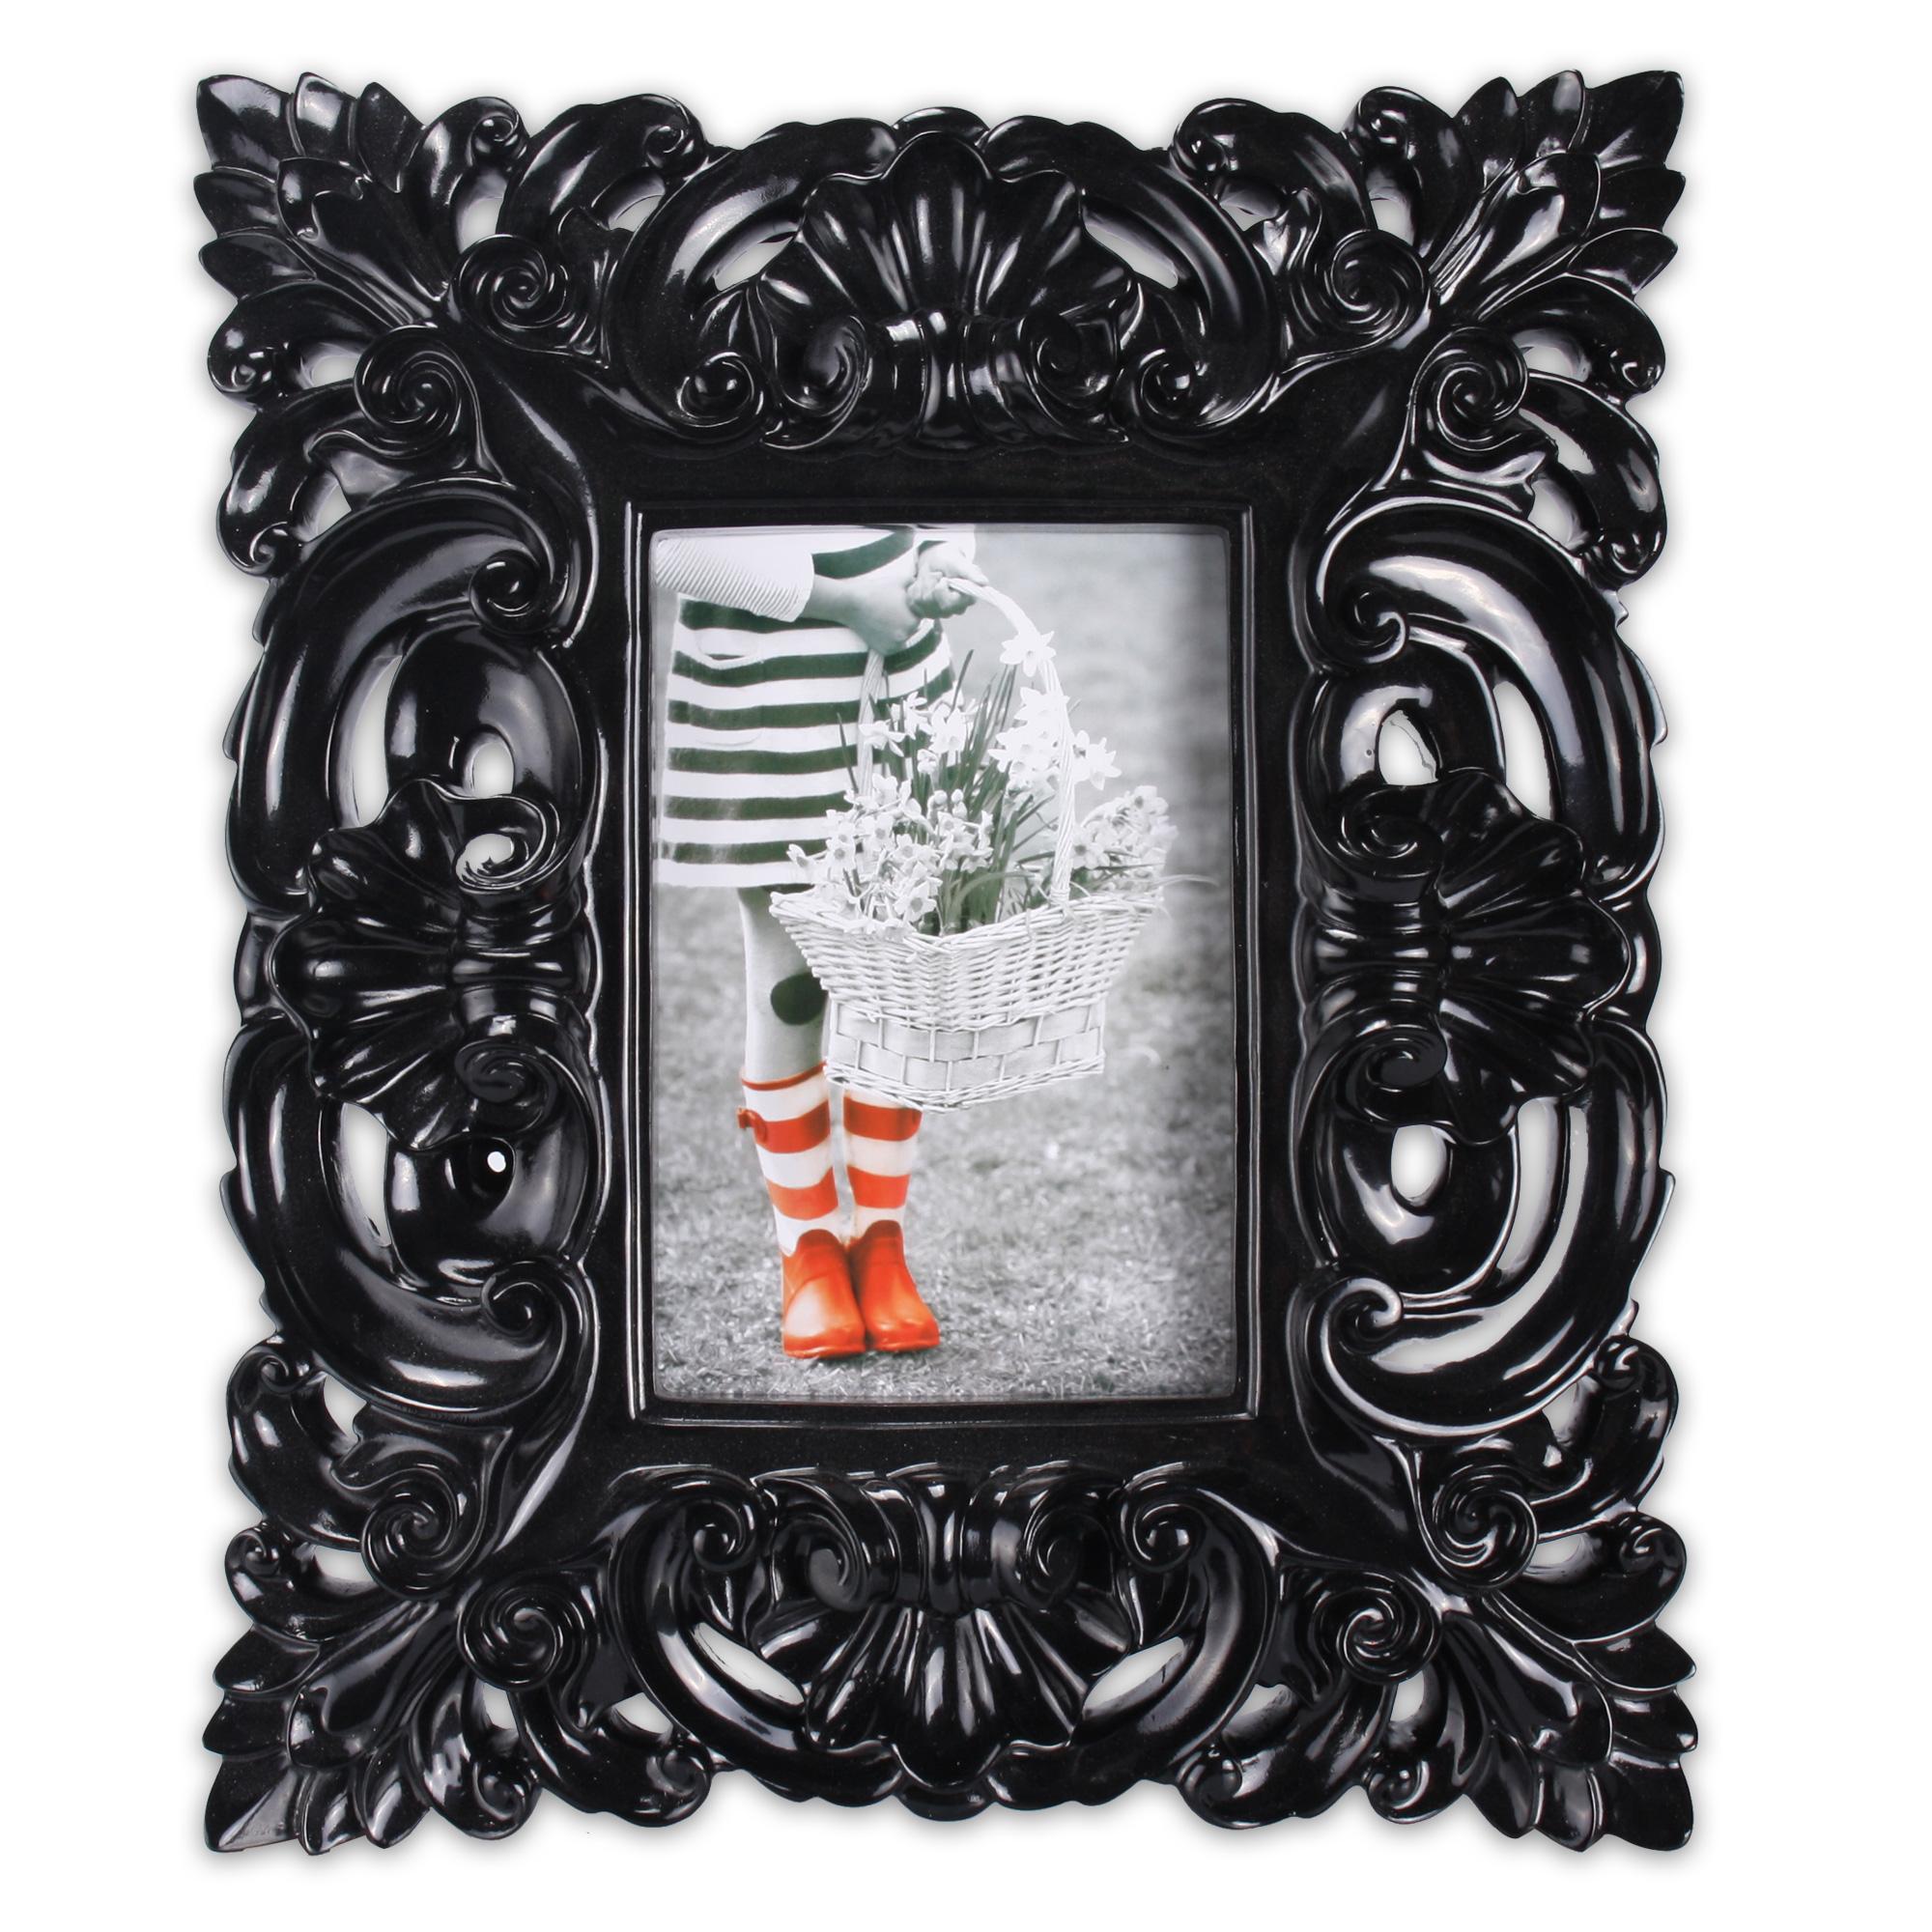 edler bilderrahmen aus kunststoff f r 1 foto 10 x 15 cm barockart in schwarz ebay. Black Bedroom Furniture Sets. Home Design Ideas